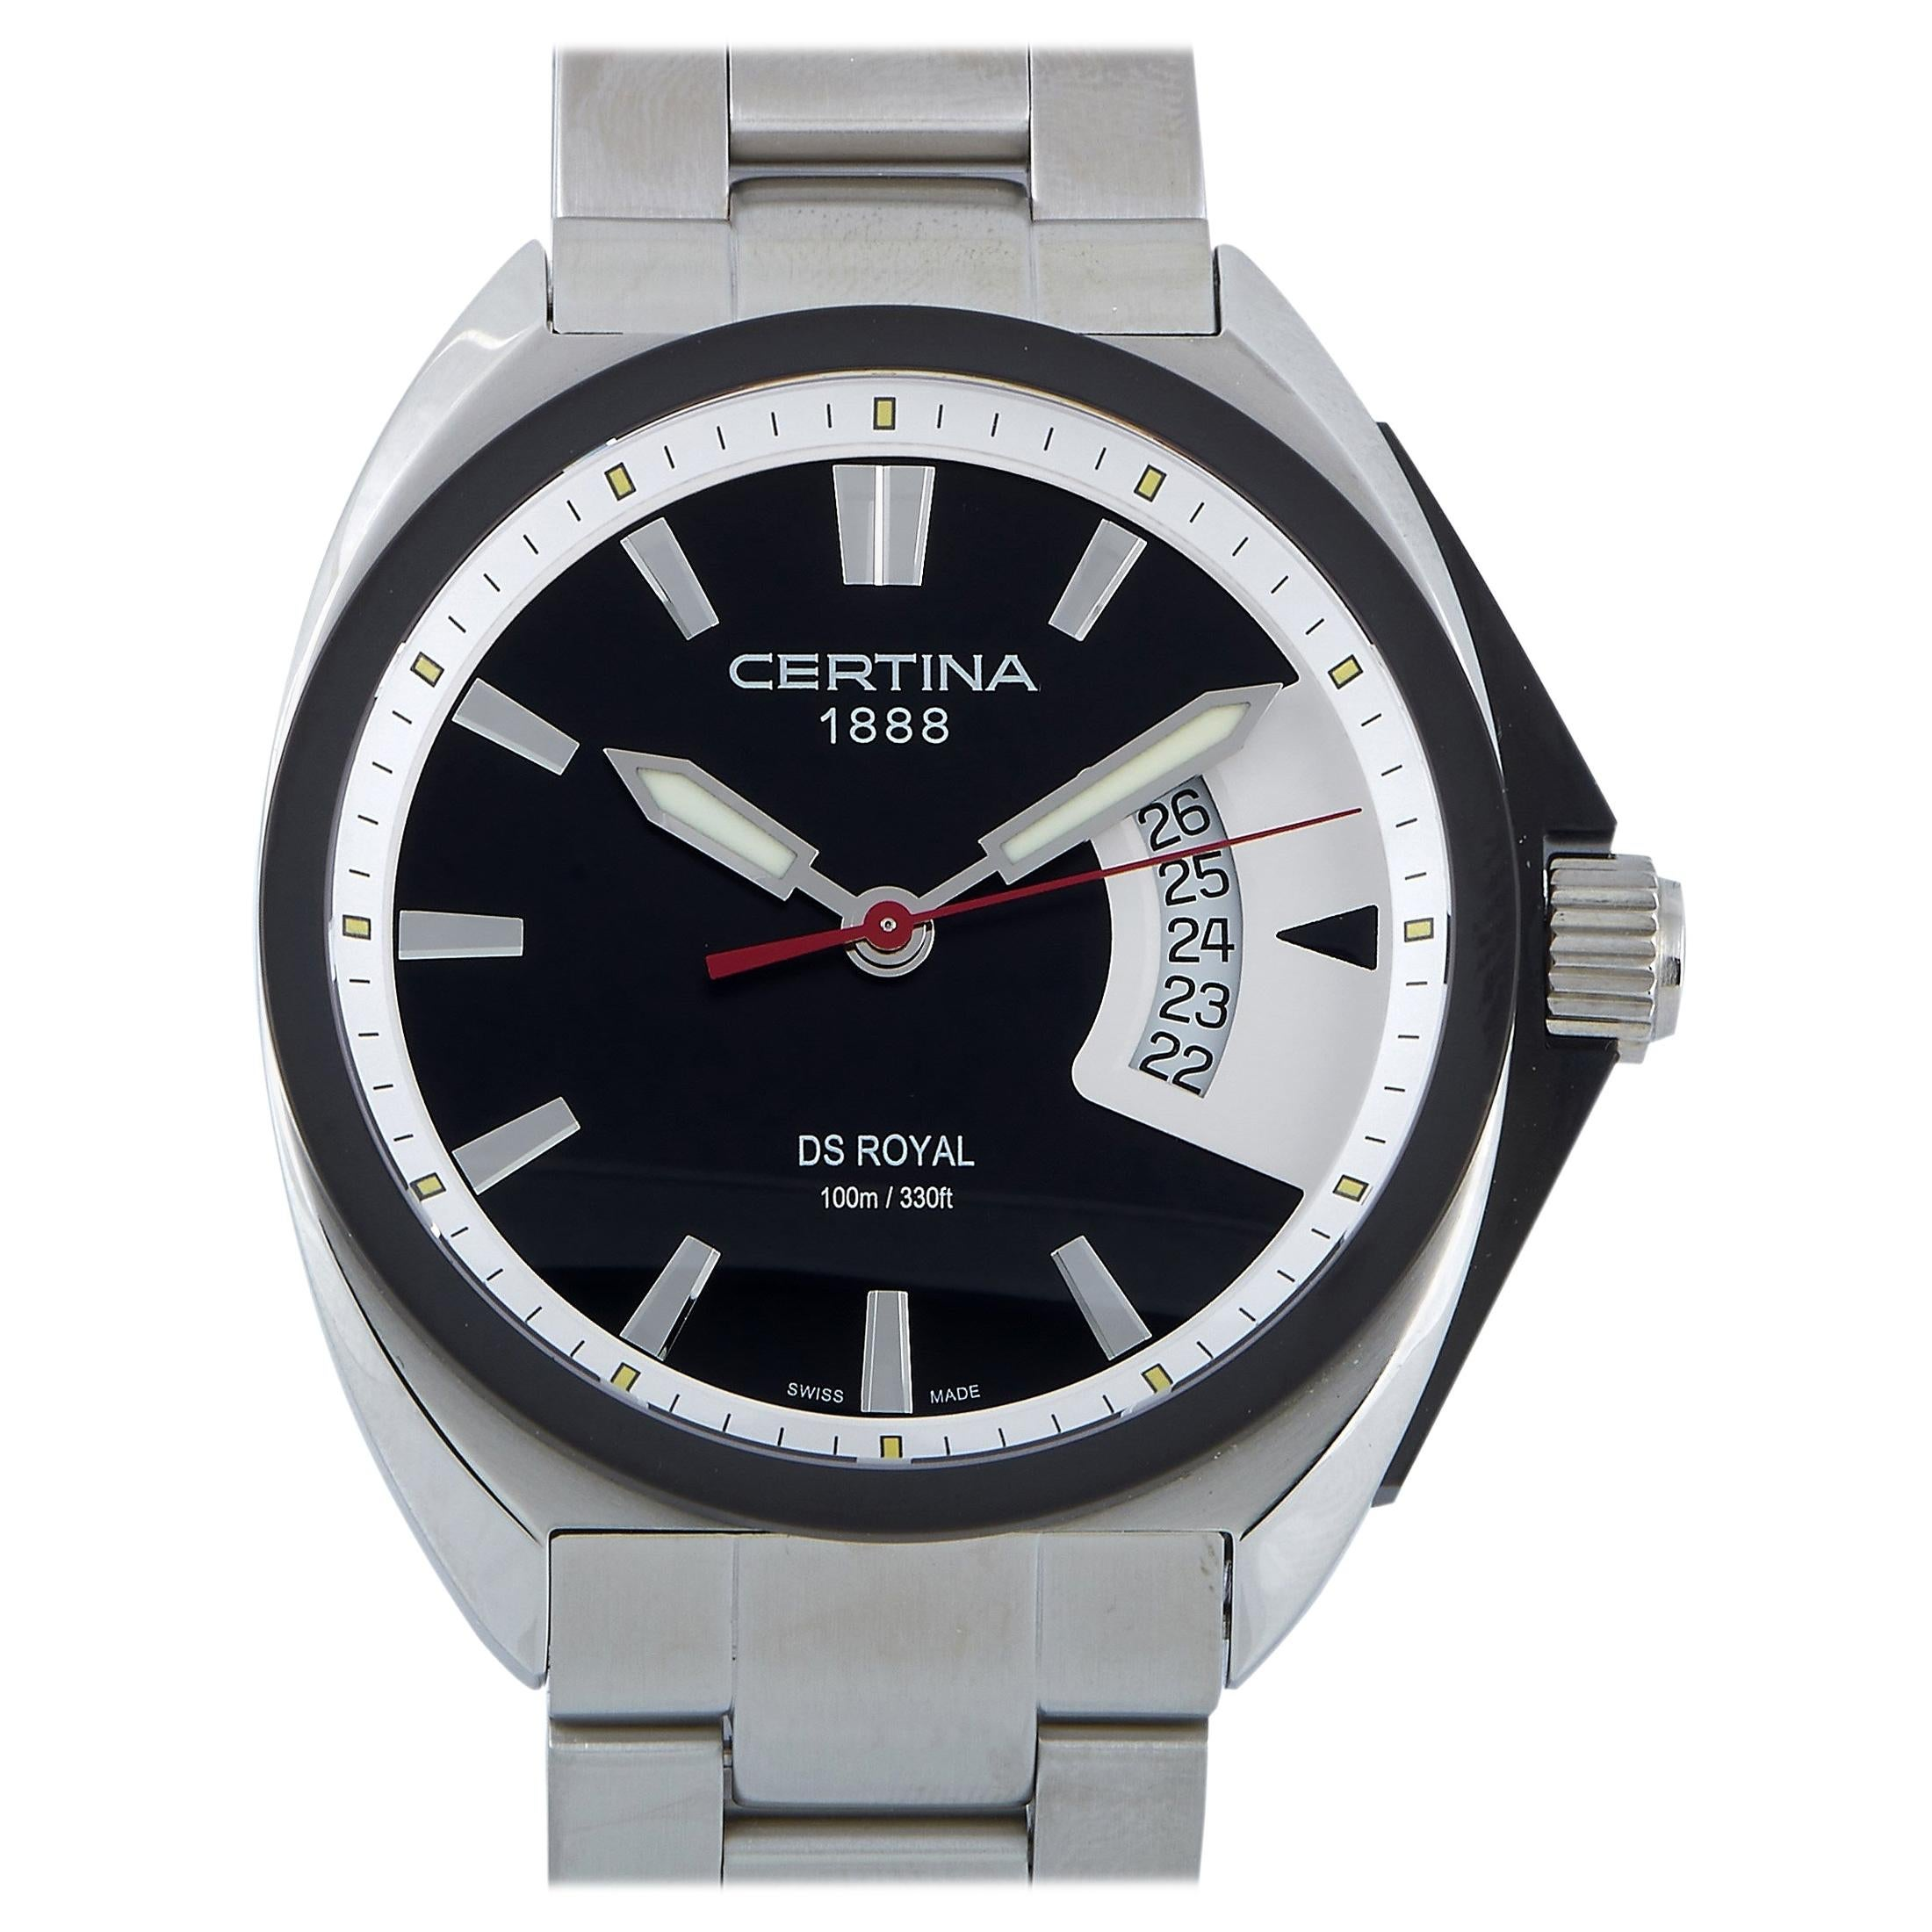 Certina DS Royal Quartz Black Dial Men's Watch C010.410.11.051.00